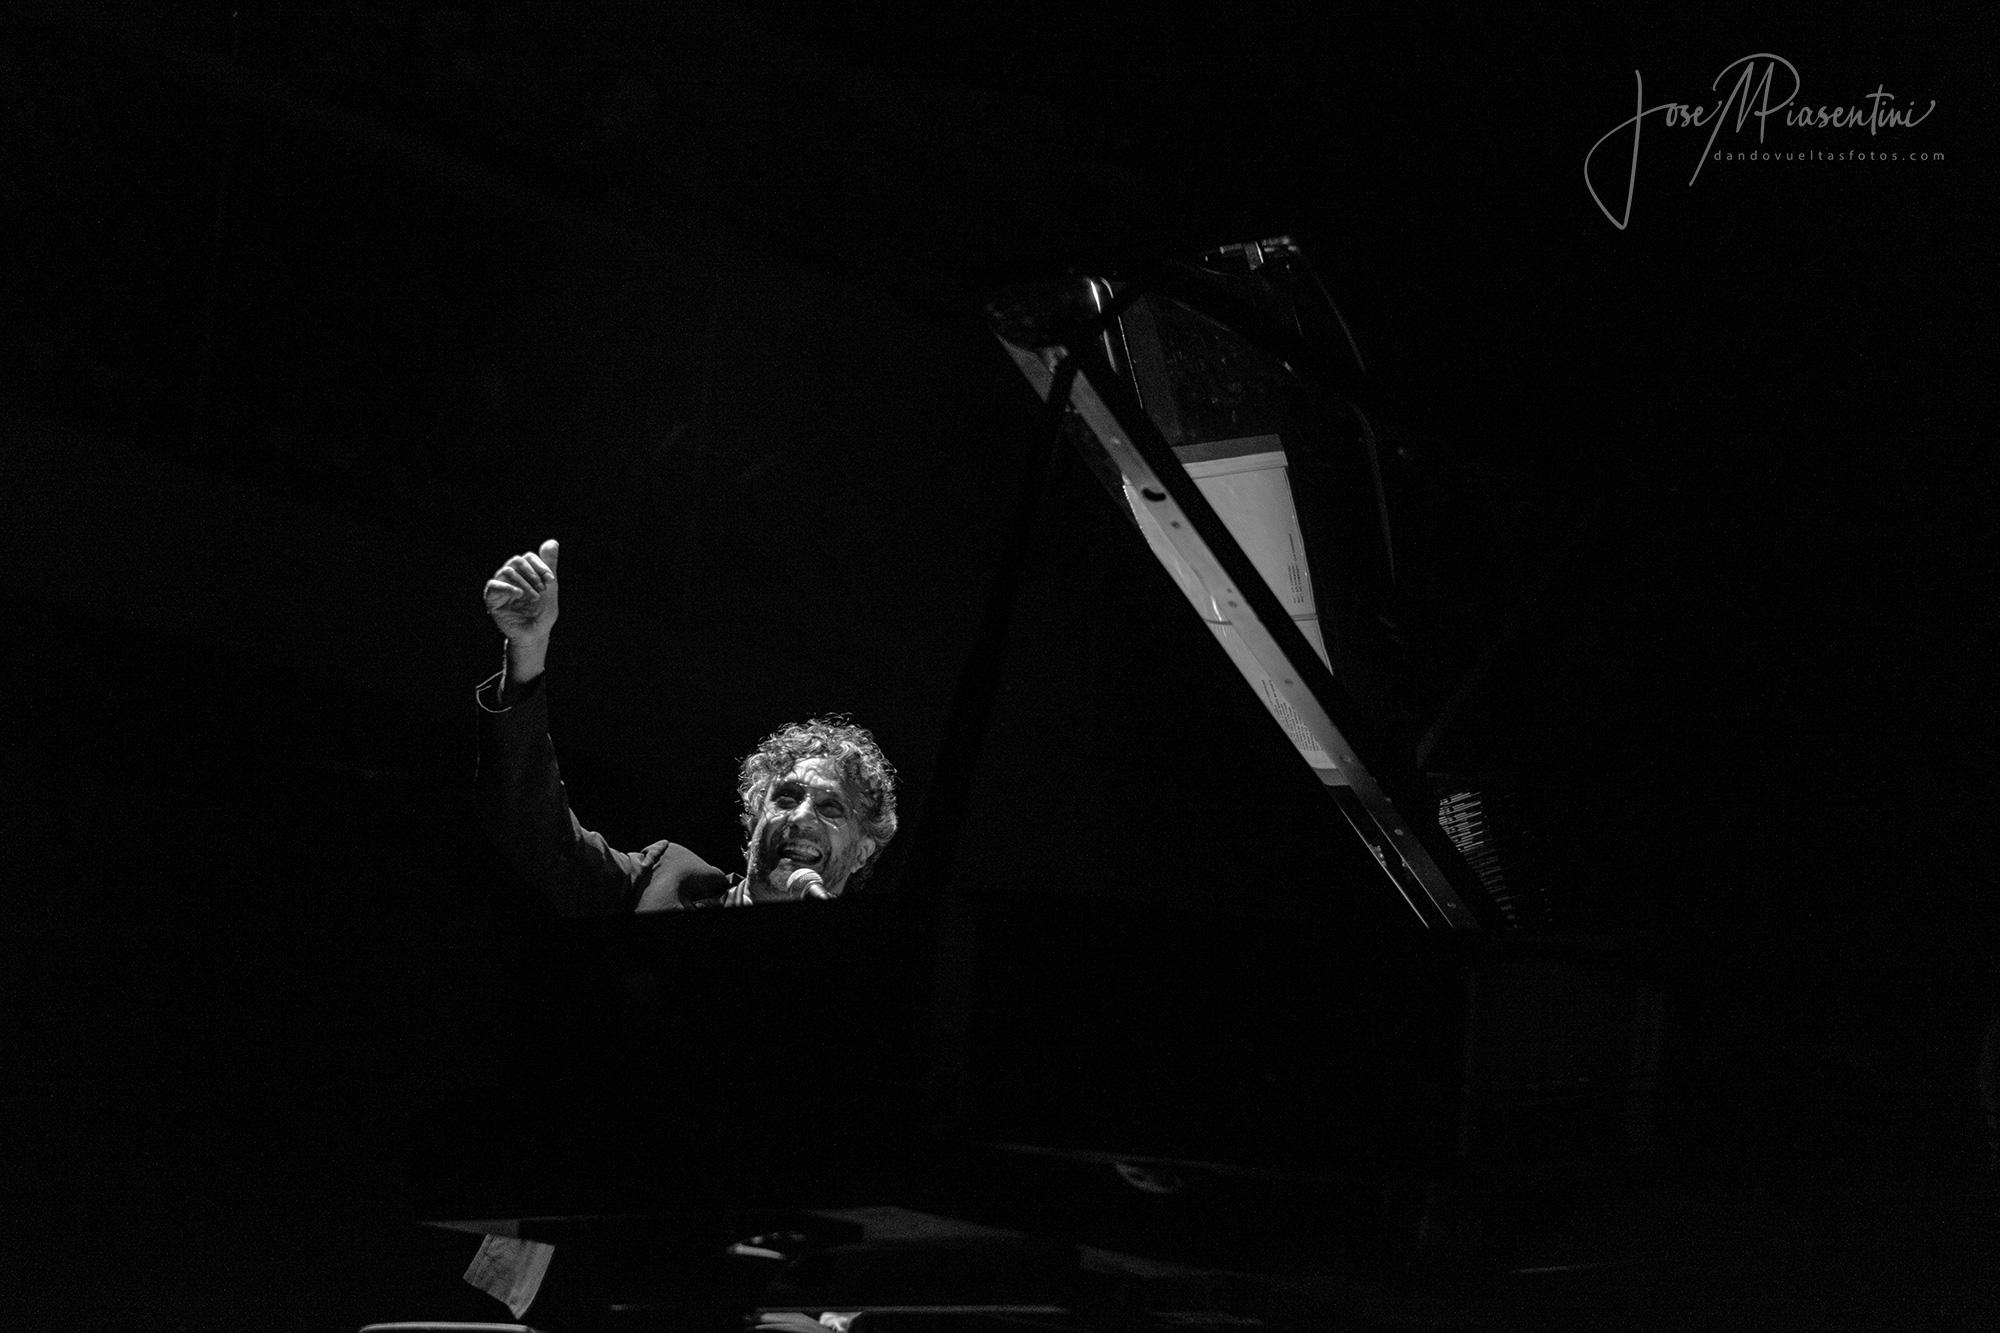 Auditorio-Nacional-Andorra-Fito-Paez